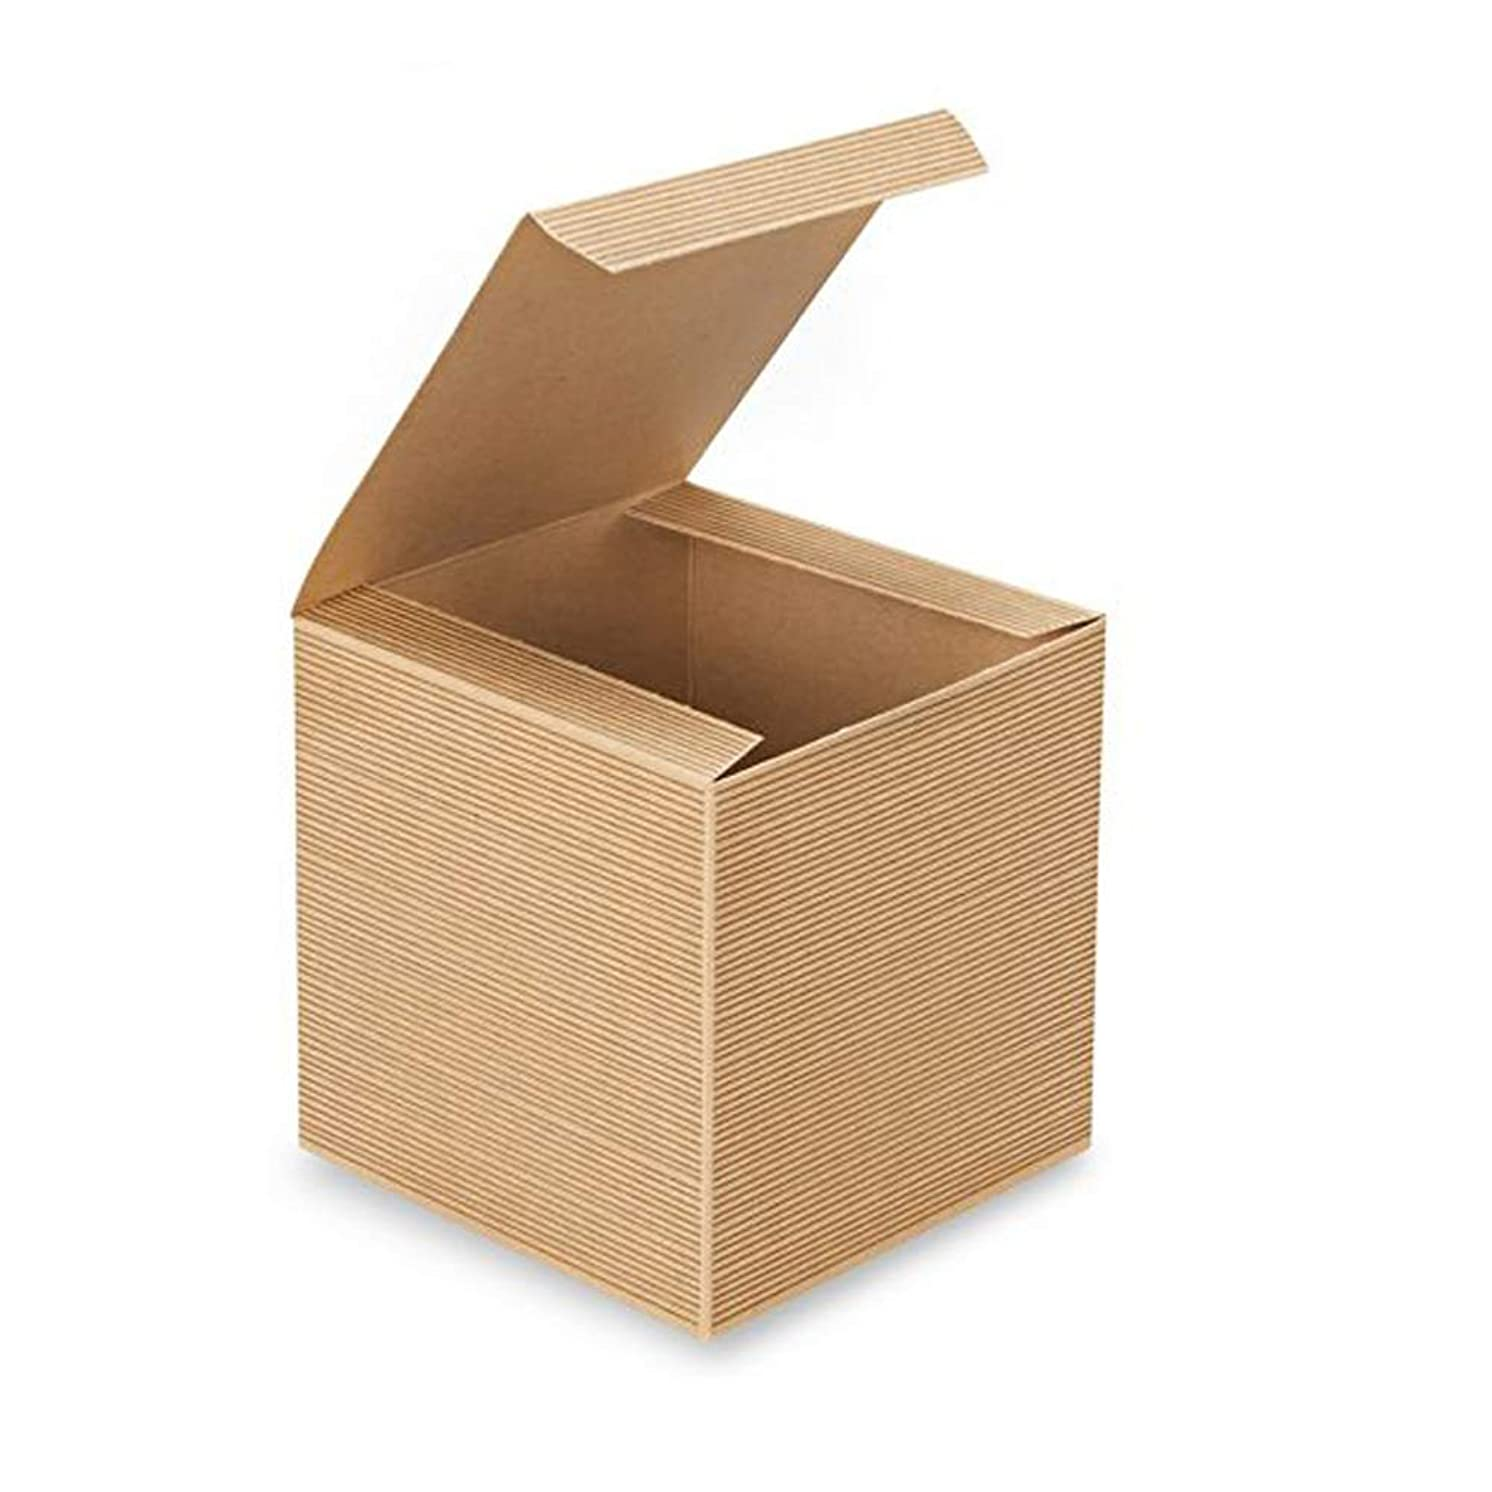 AwePackage 24 Count of Pinstripe Kraft Gift Box - 5x5x5